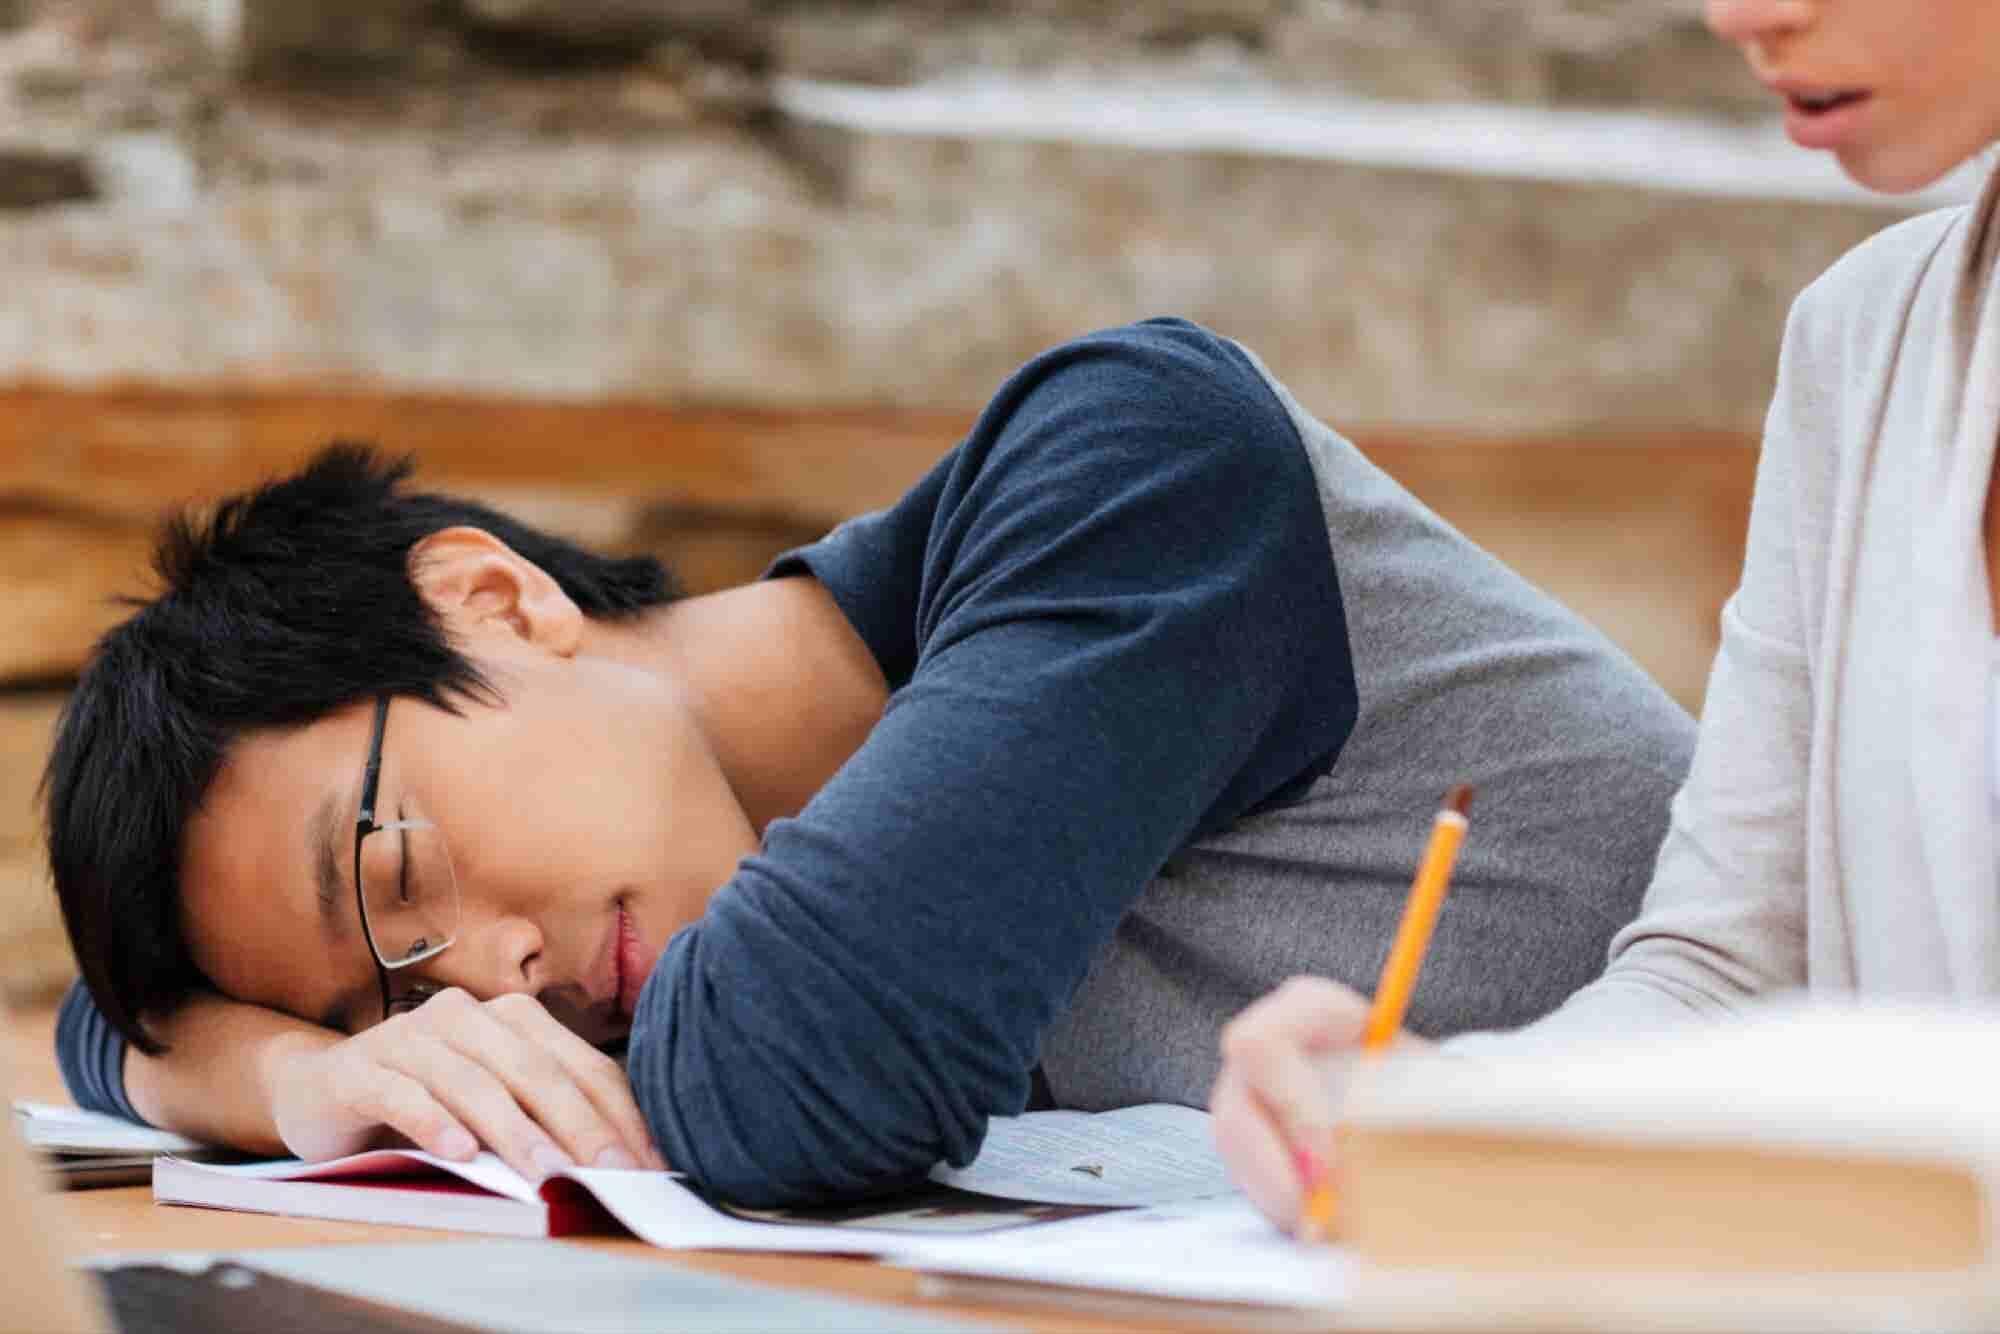 The Billion-Dollar Reason You Should Get More Sleep